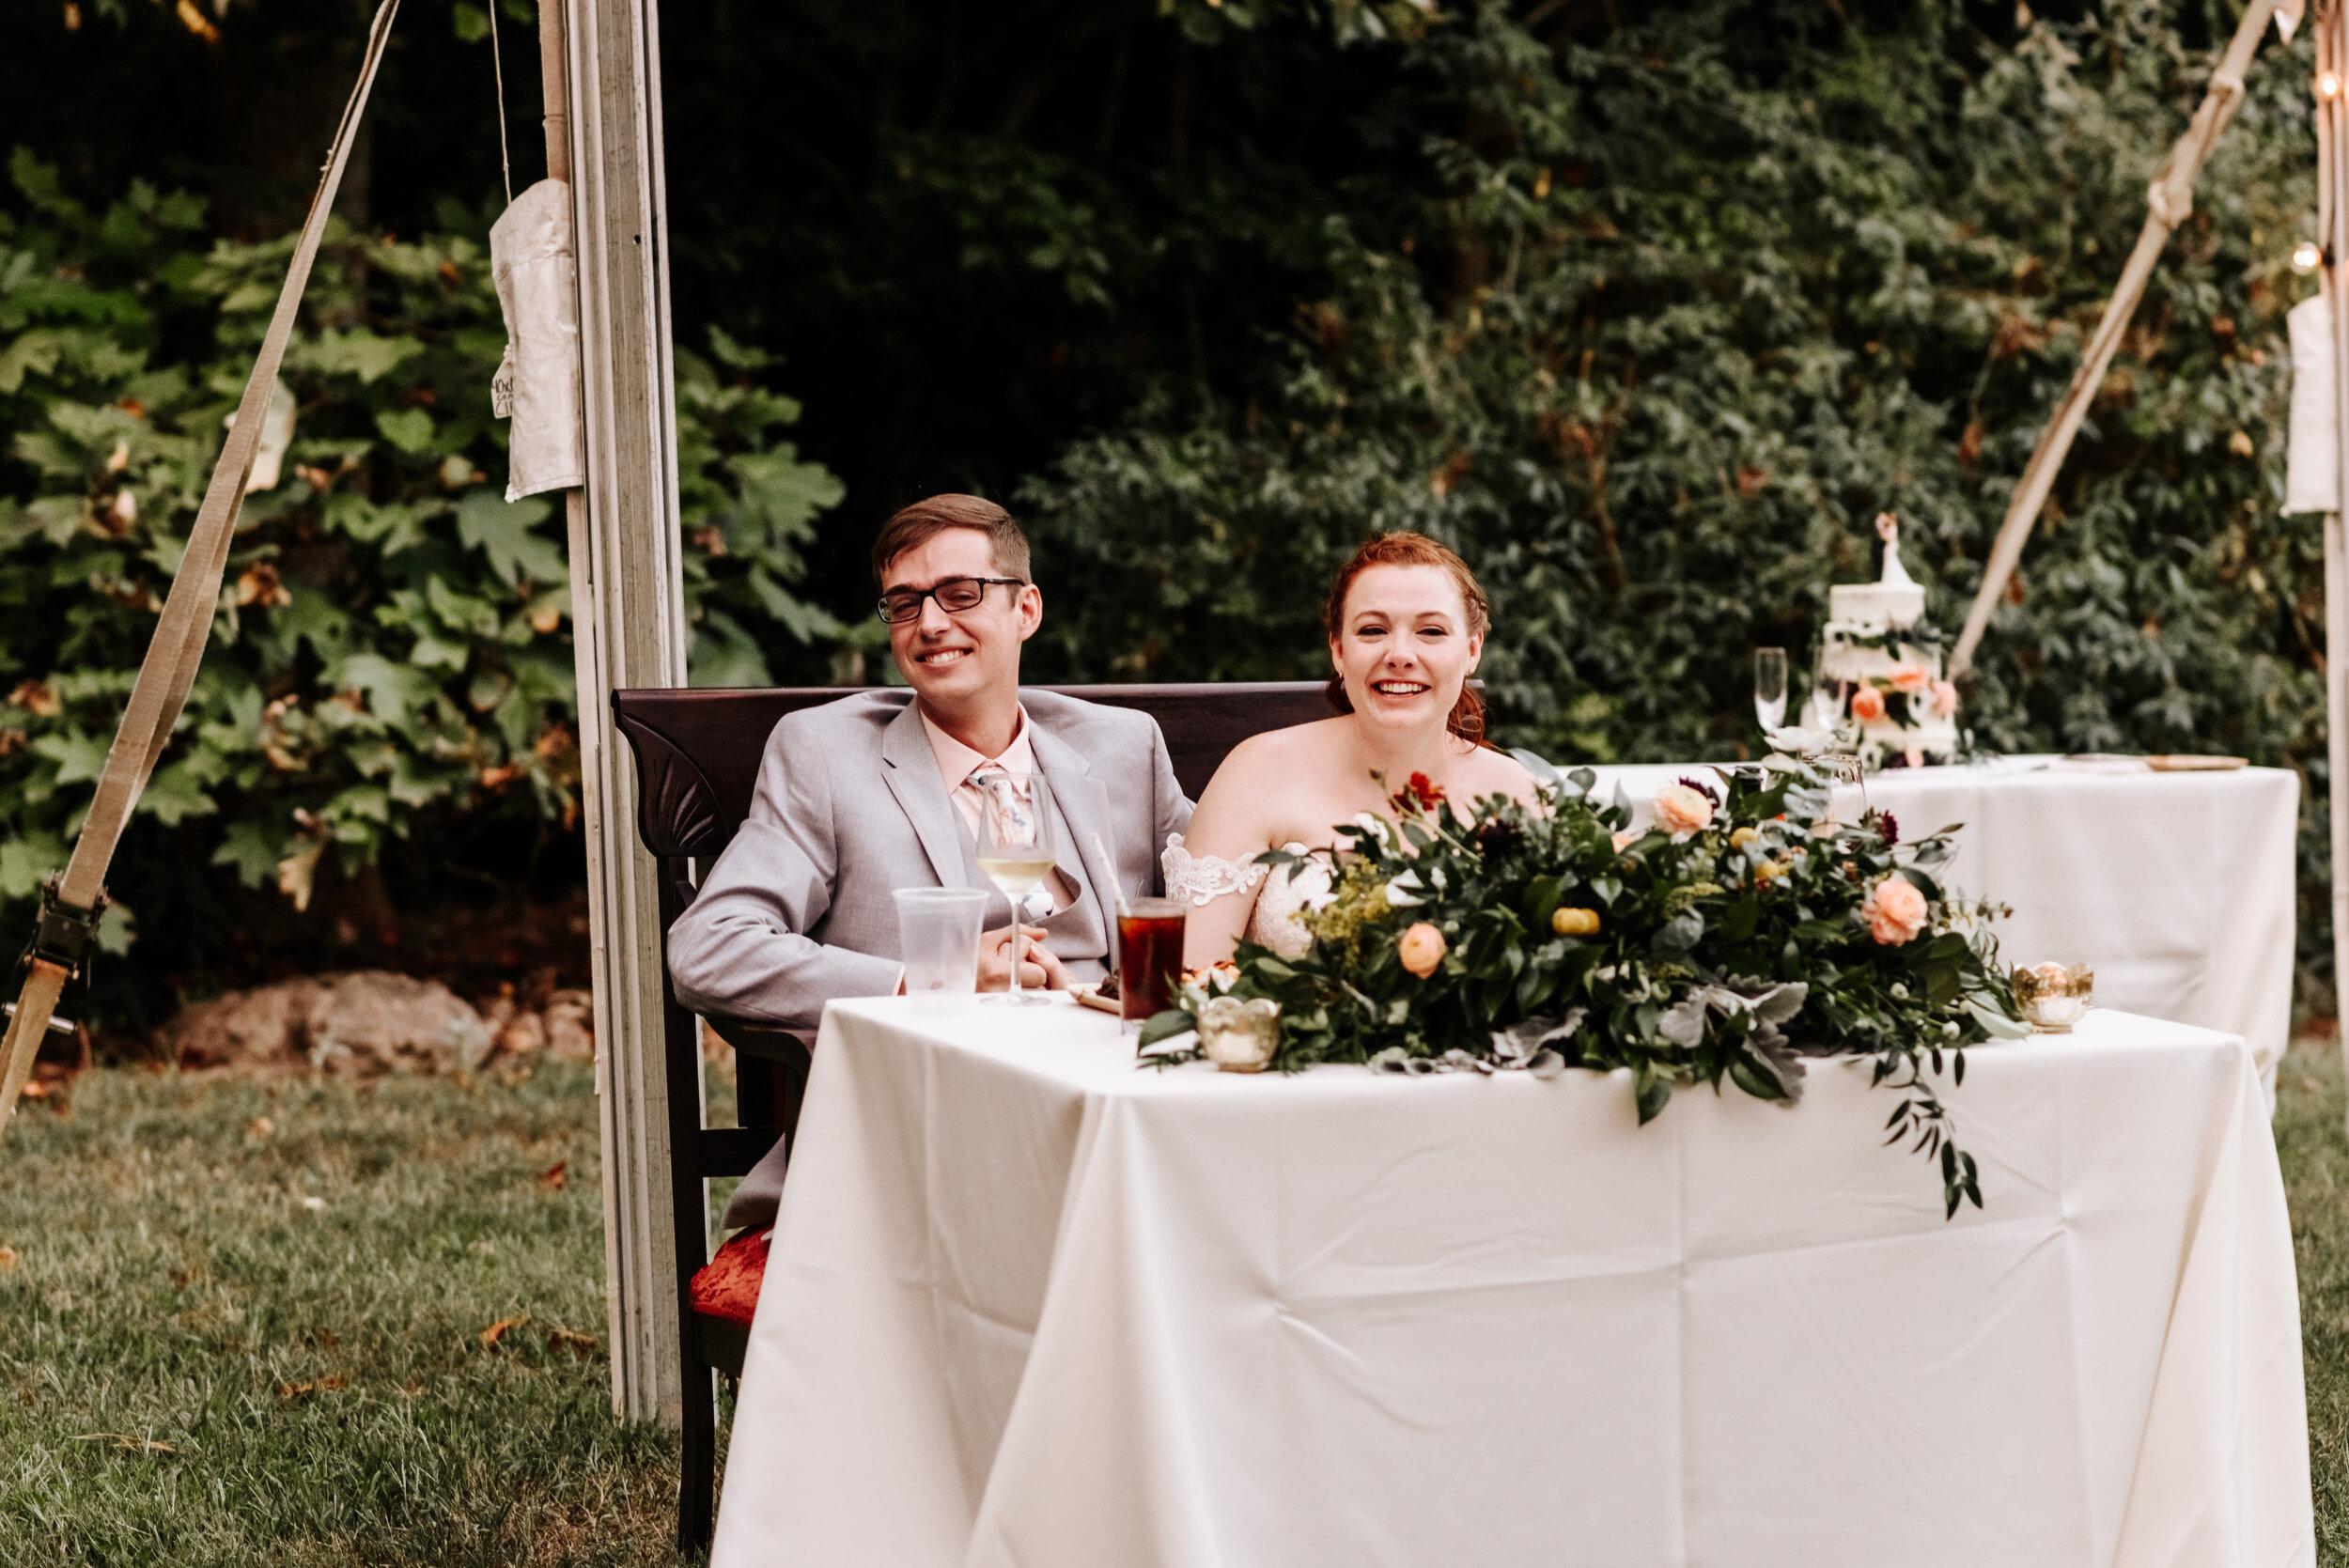 Rachel_David_Wedding_Richmond_Virginia_Photography_by_V_77.jpg